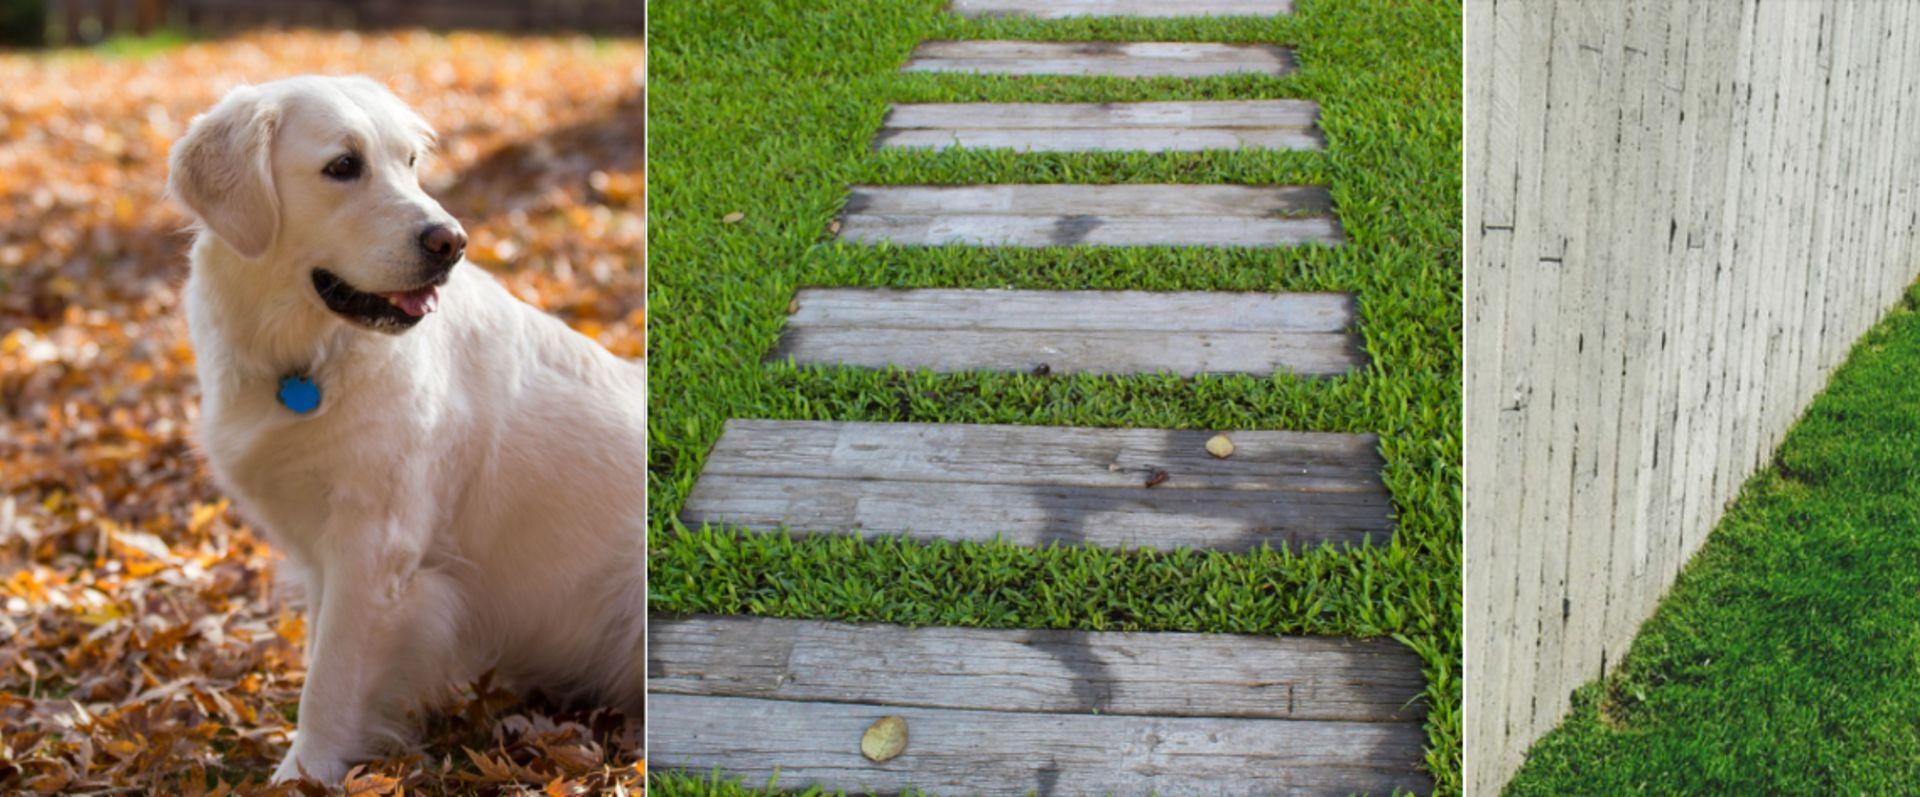 How to Prepare Your Lawn for Winter in San Antonio